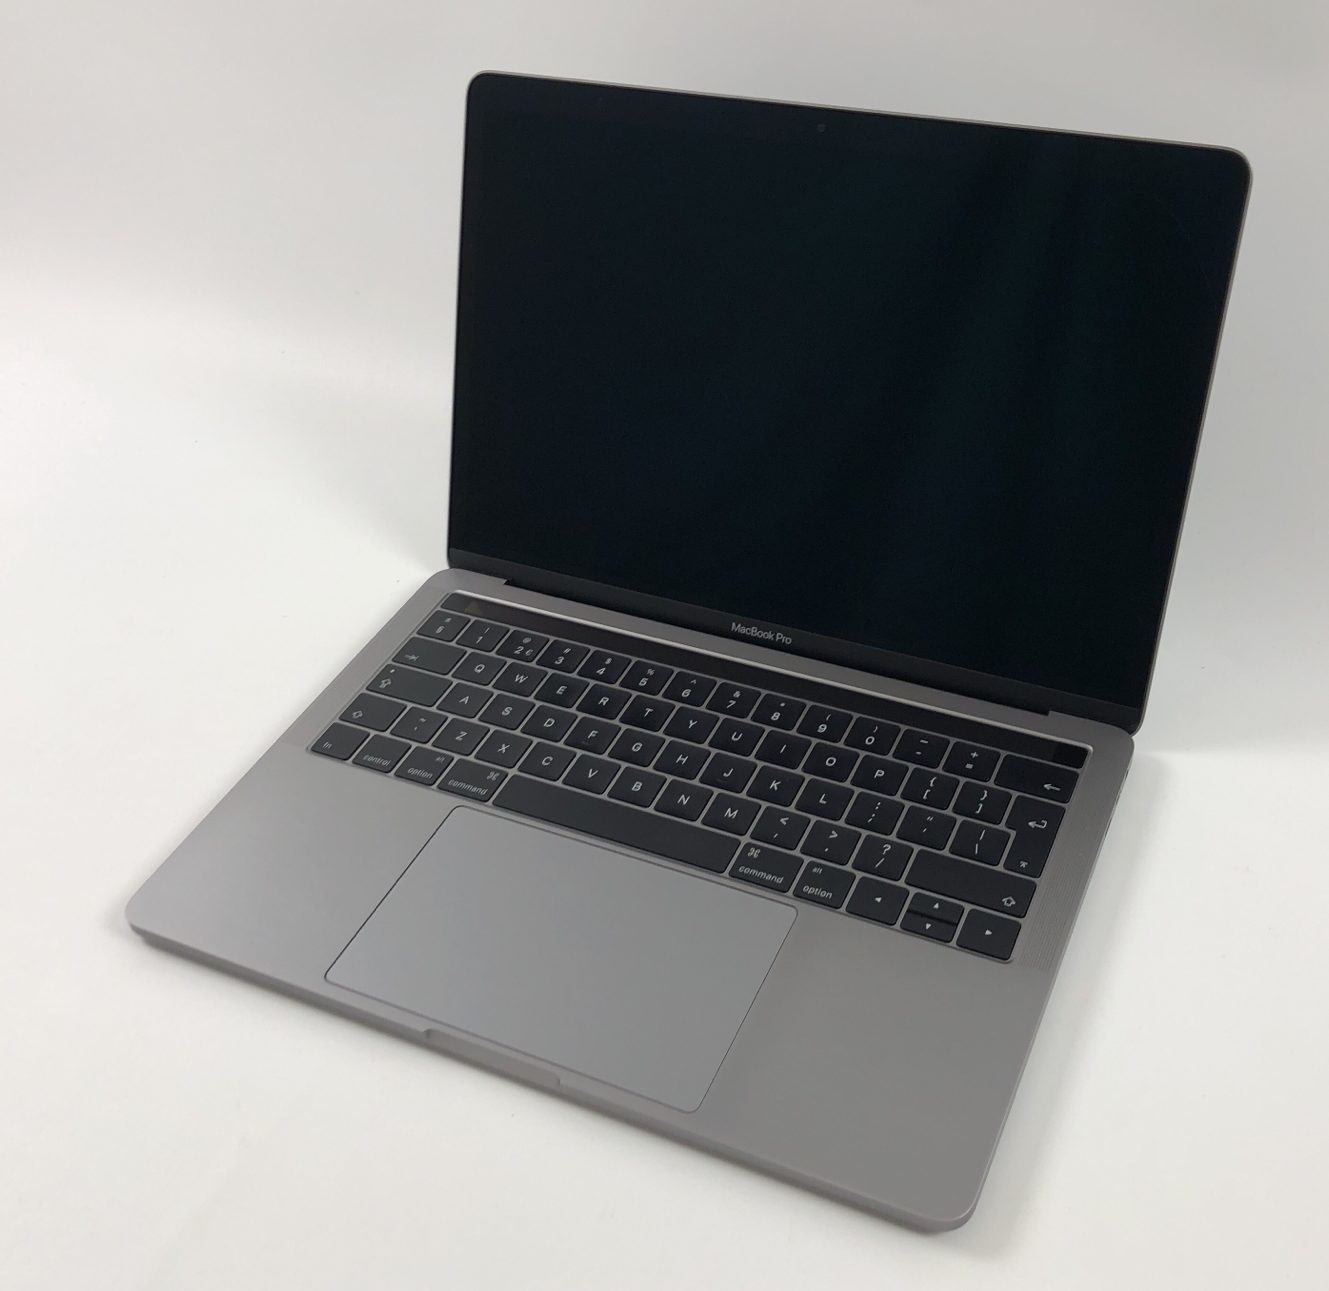 "MacBook Pro 13"" 4TBT Late 2016 (Intel Core i5 2.9 GHz 16 GB RAM 512 GB SSD), Space Gray, Intel Core i5 2.9 GHz, 16 GB RAM, 512 GB SSD, Afbeelding 1"